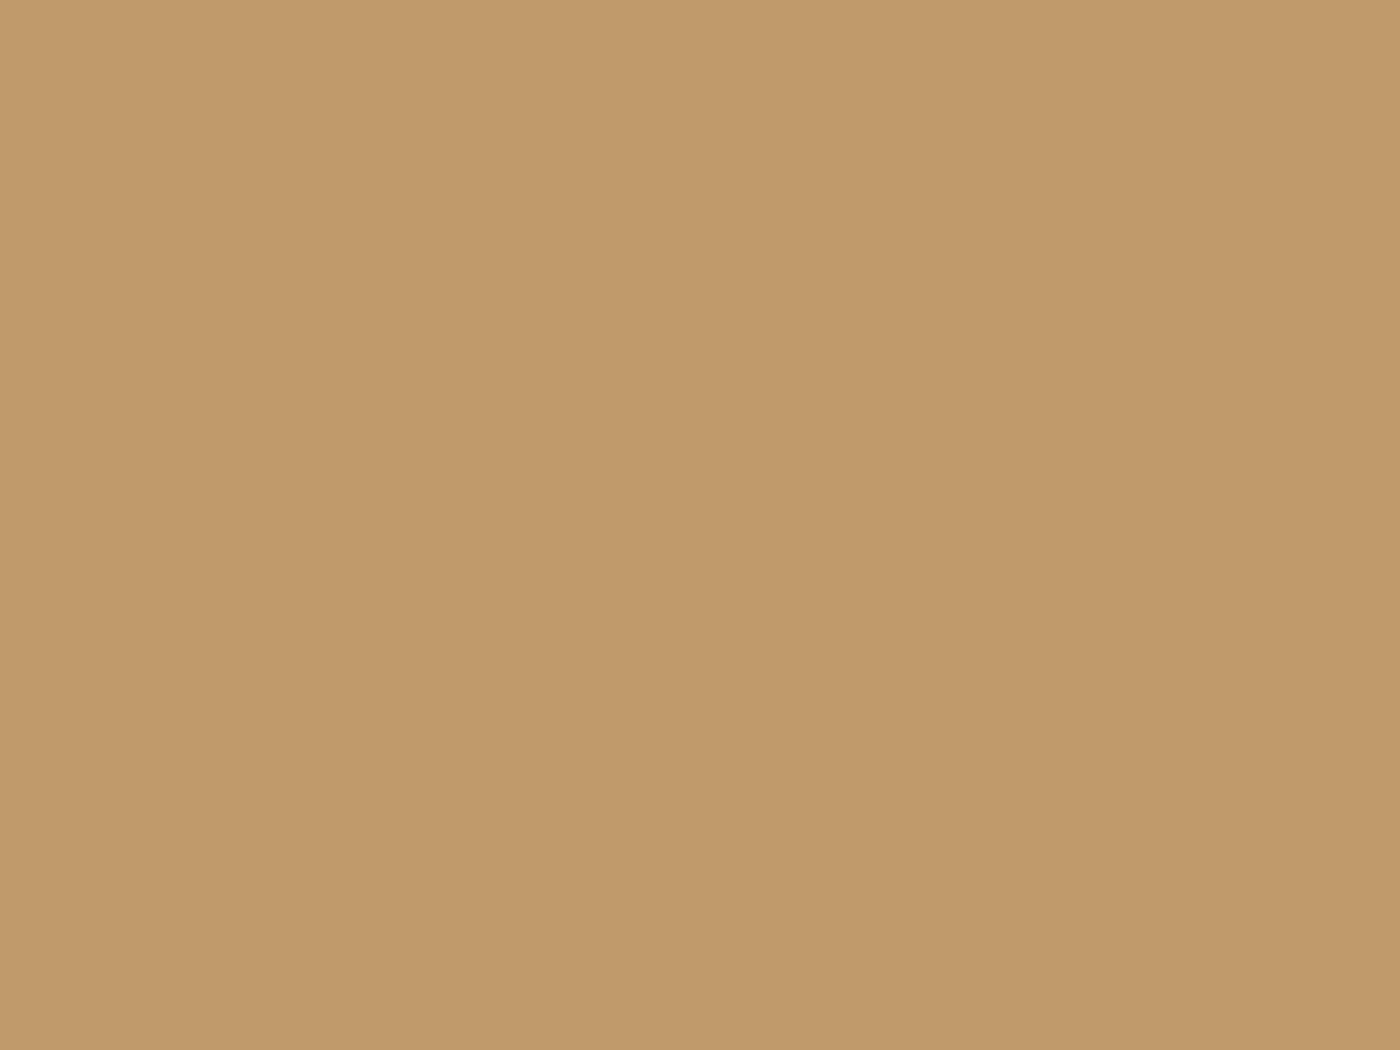 1400x1050 Camel Solid Color Background